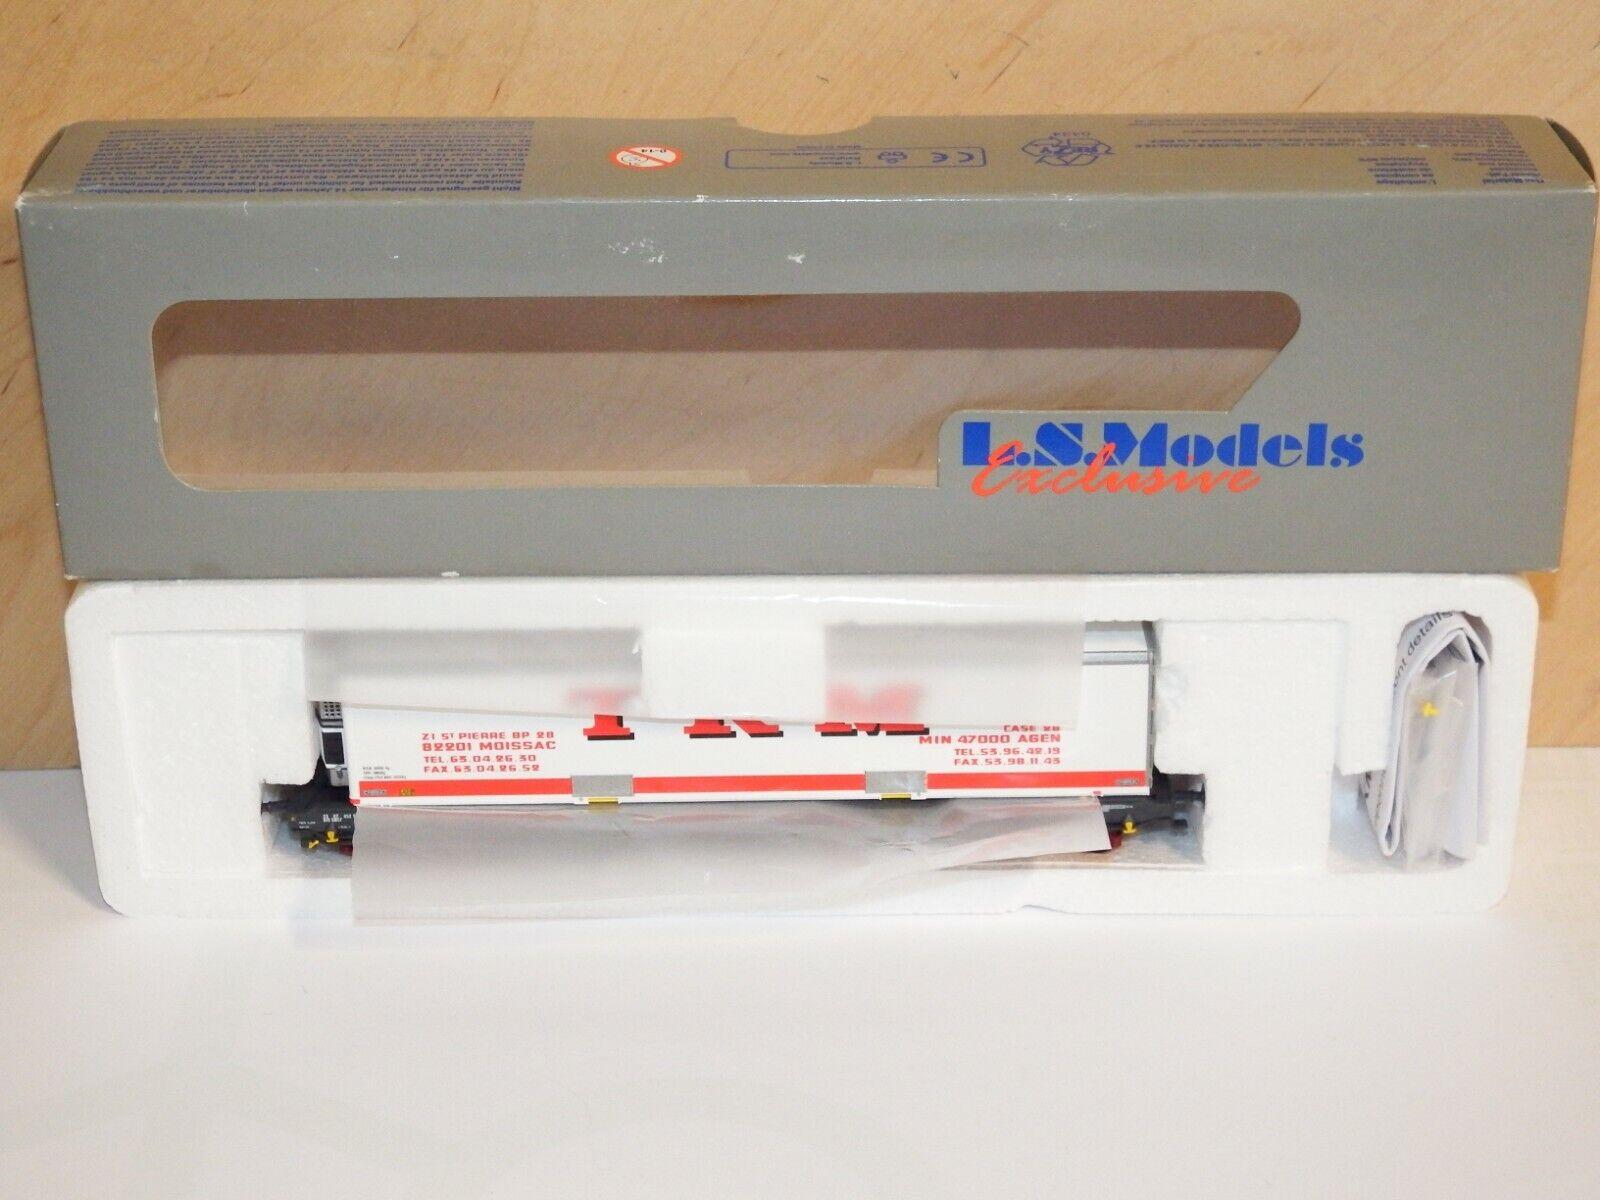 H0 LS MODELS 30302 container Carrello 40' SNCF KKK KKK KKK come nuovo OVP 6522 9b7b53